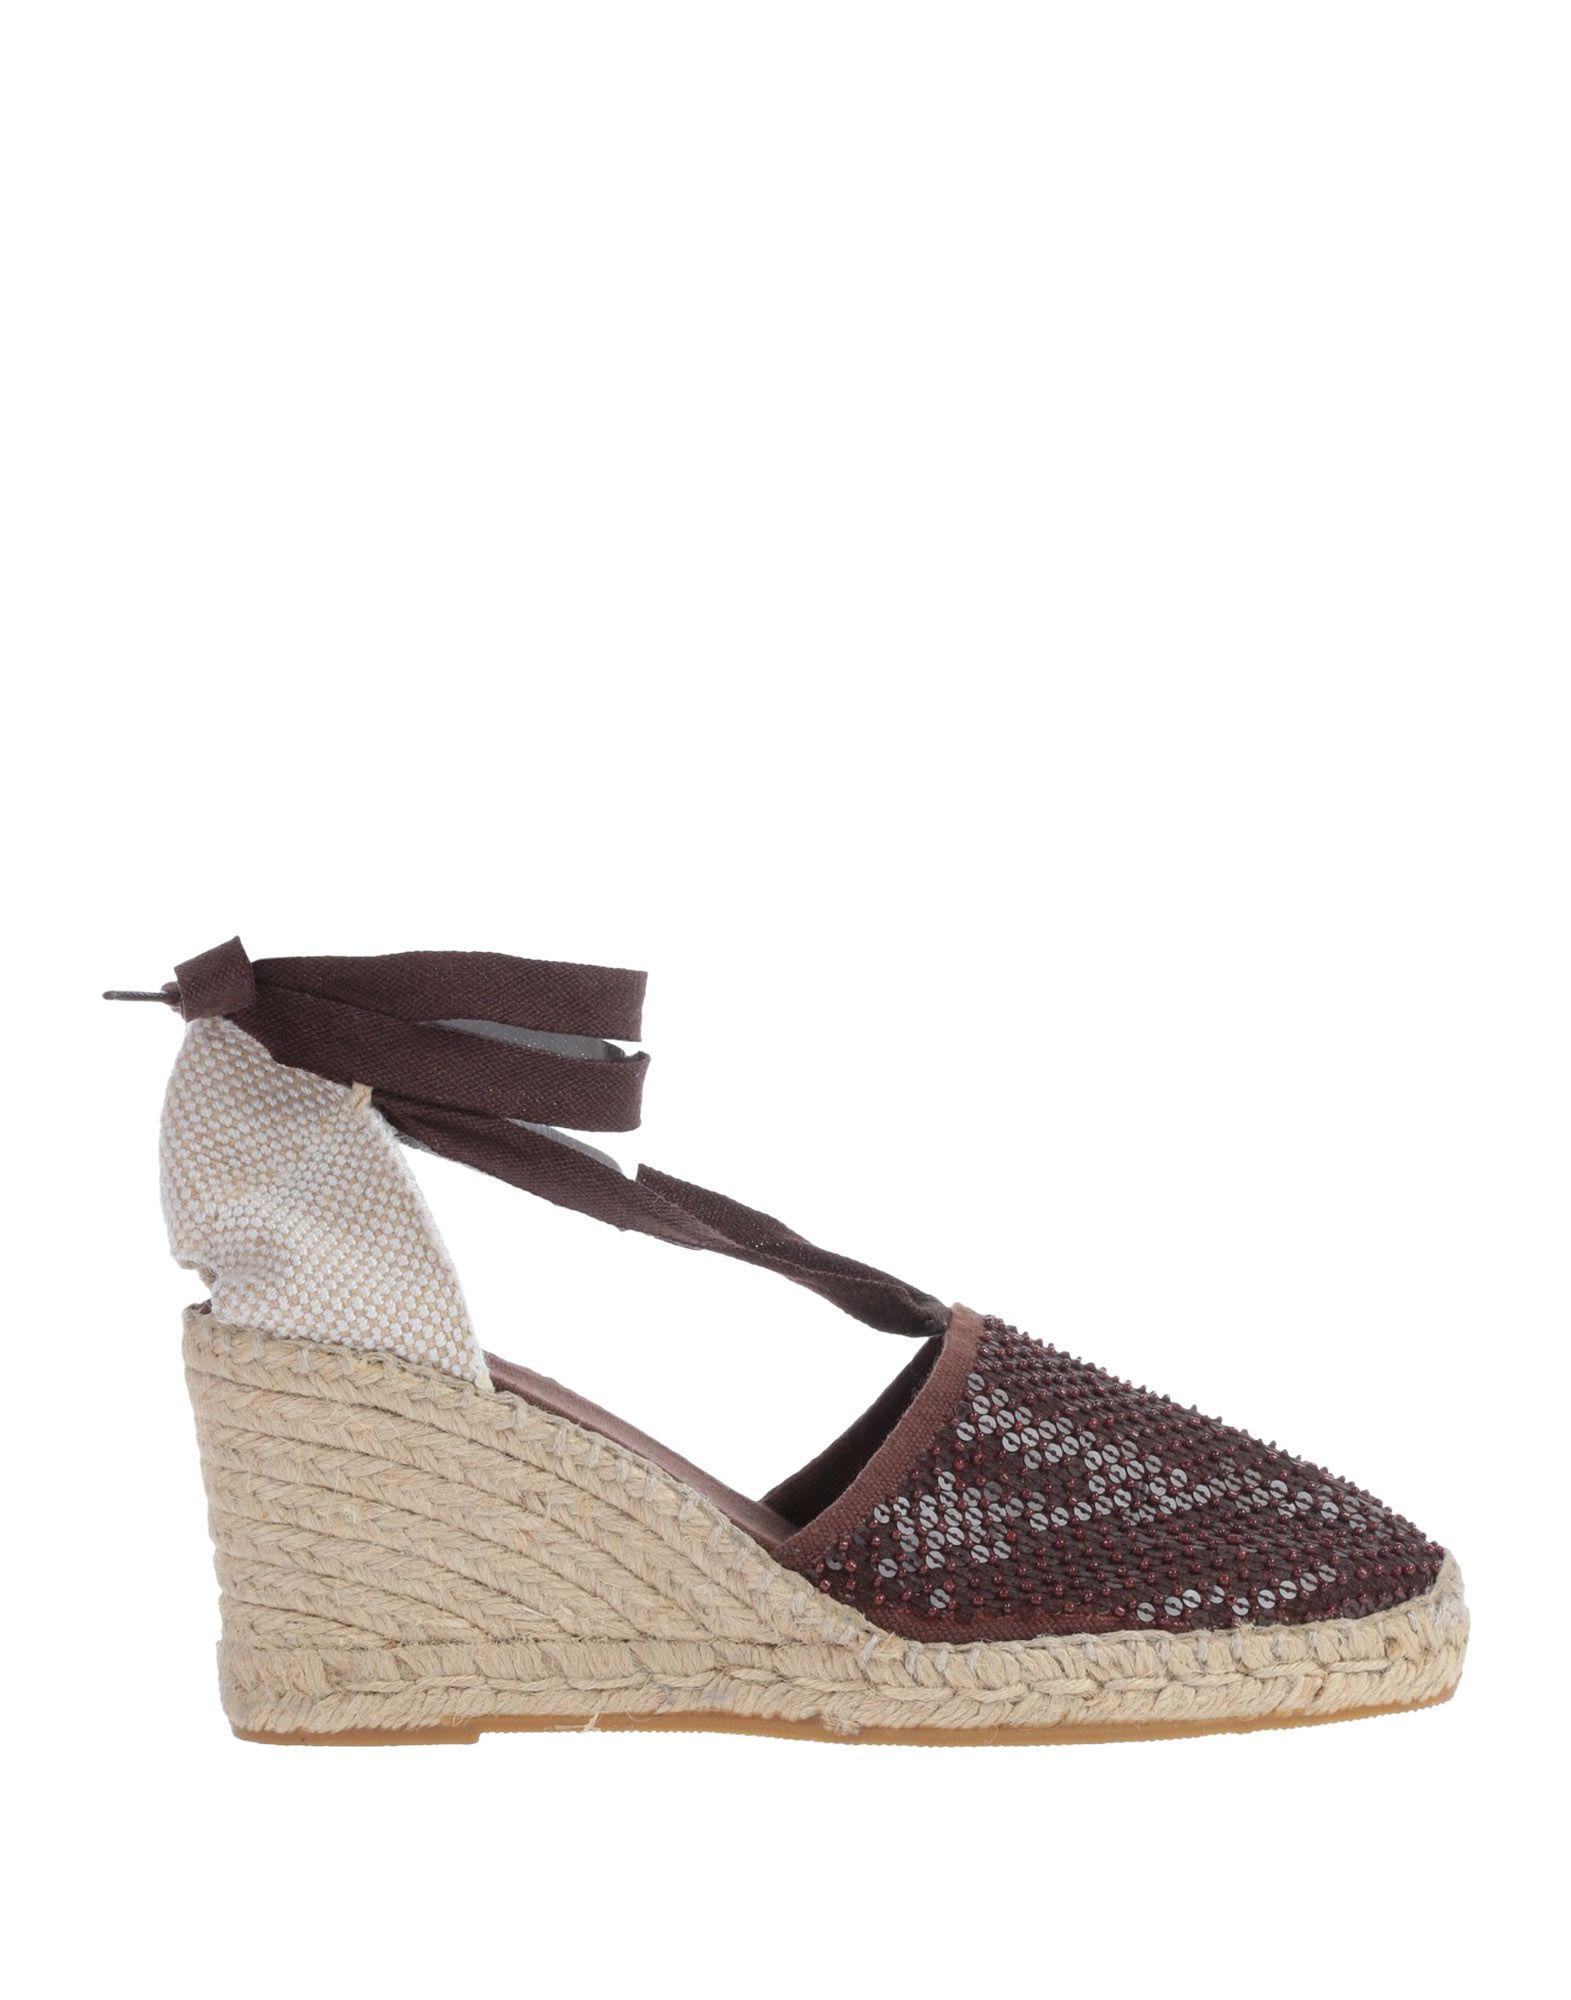 Espadrilles For Jo No Fui Espadrilles Damen  11524897HM Gute Qualität beliebte Schuhe